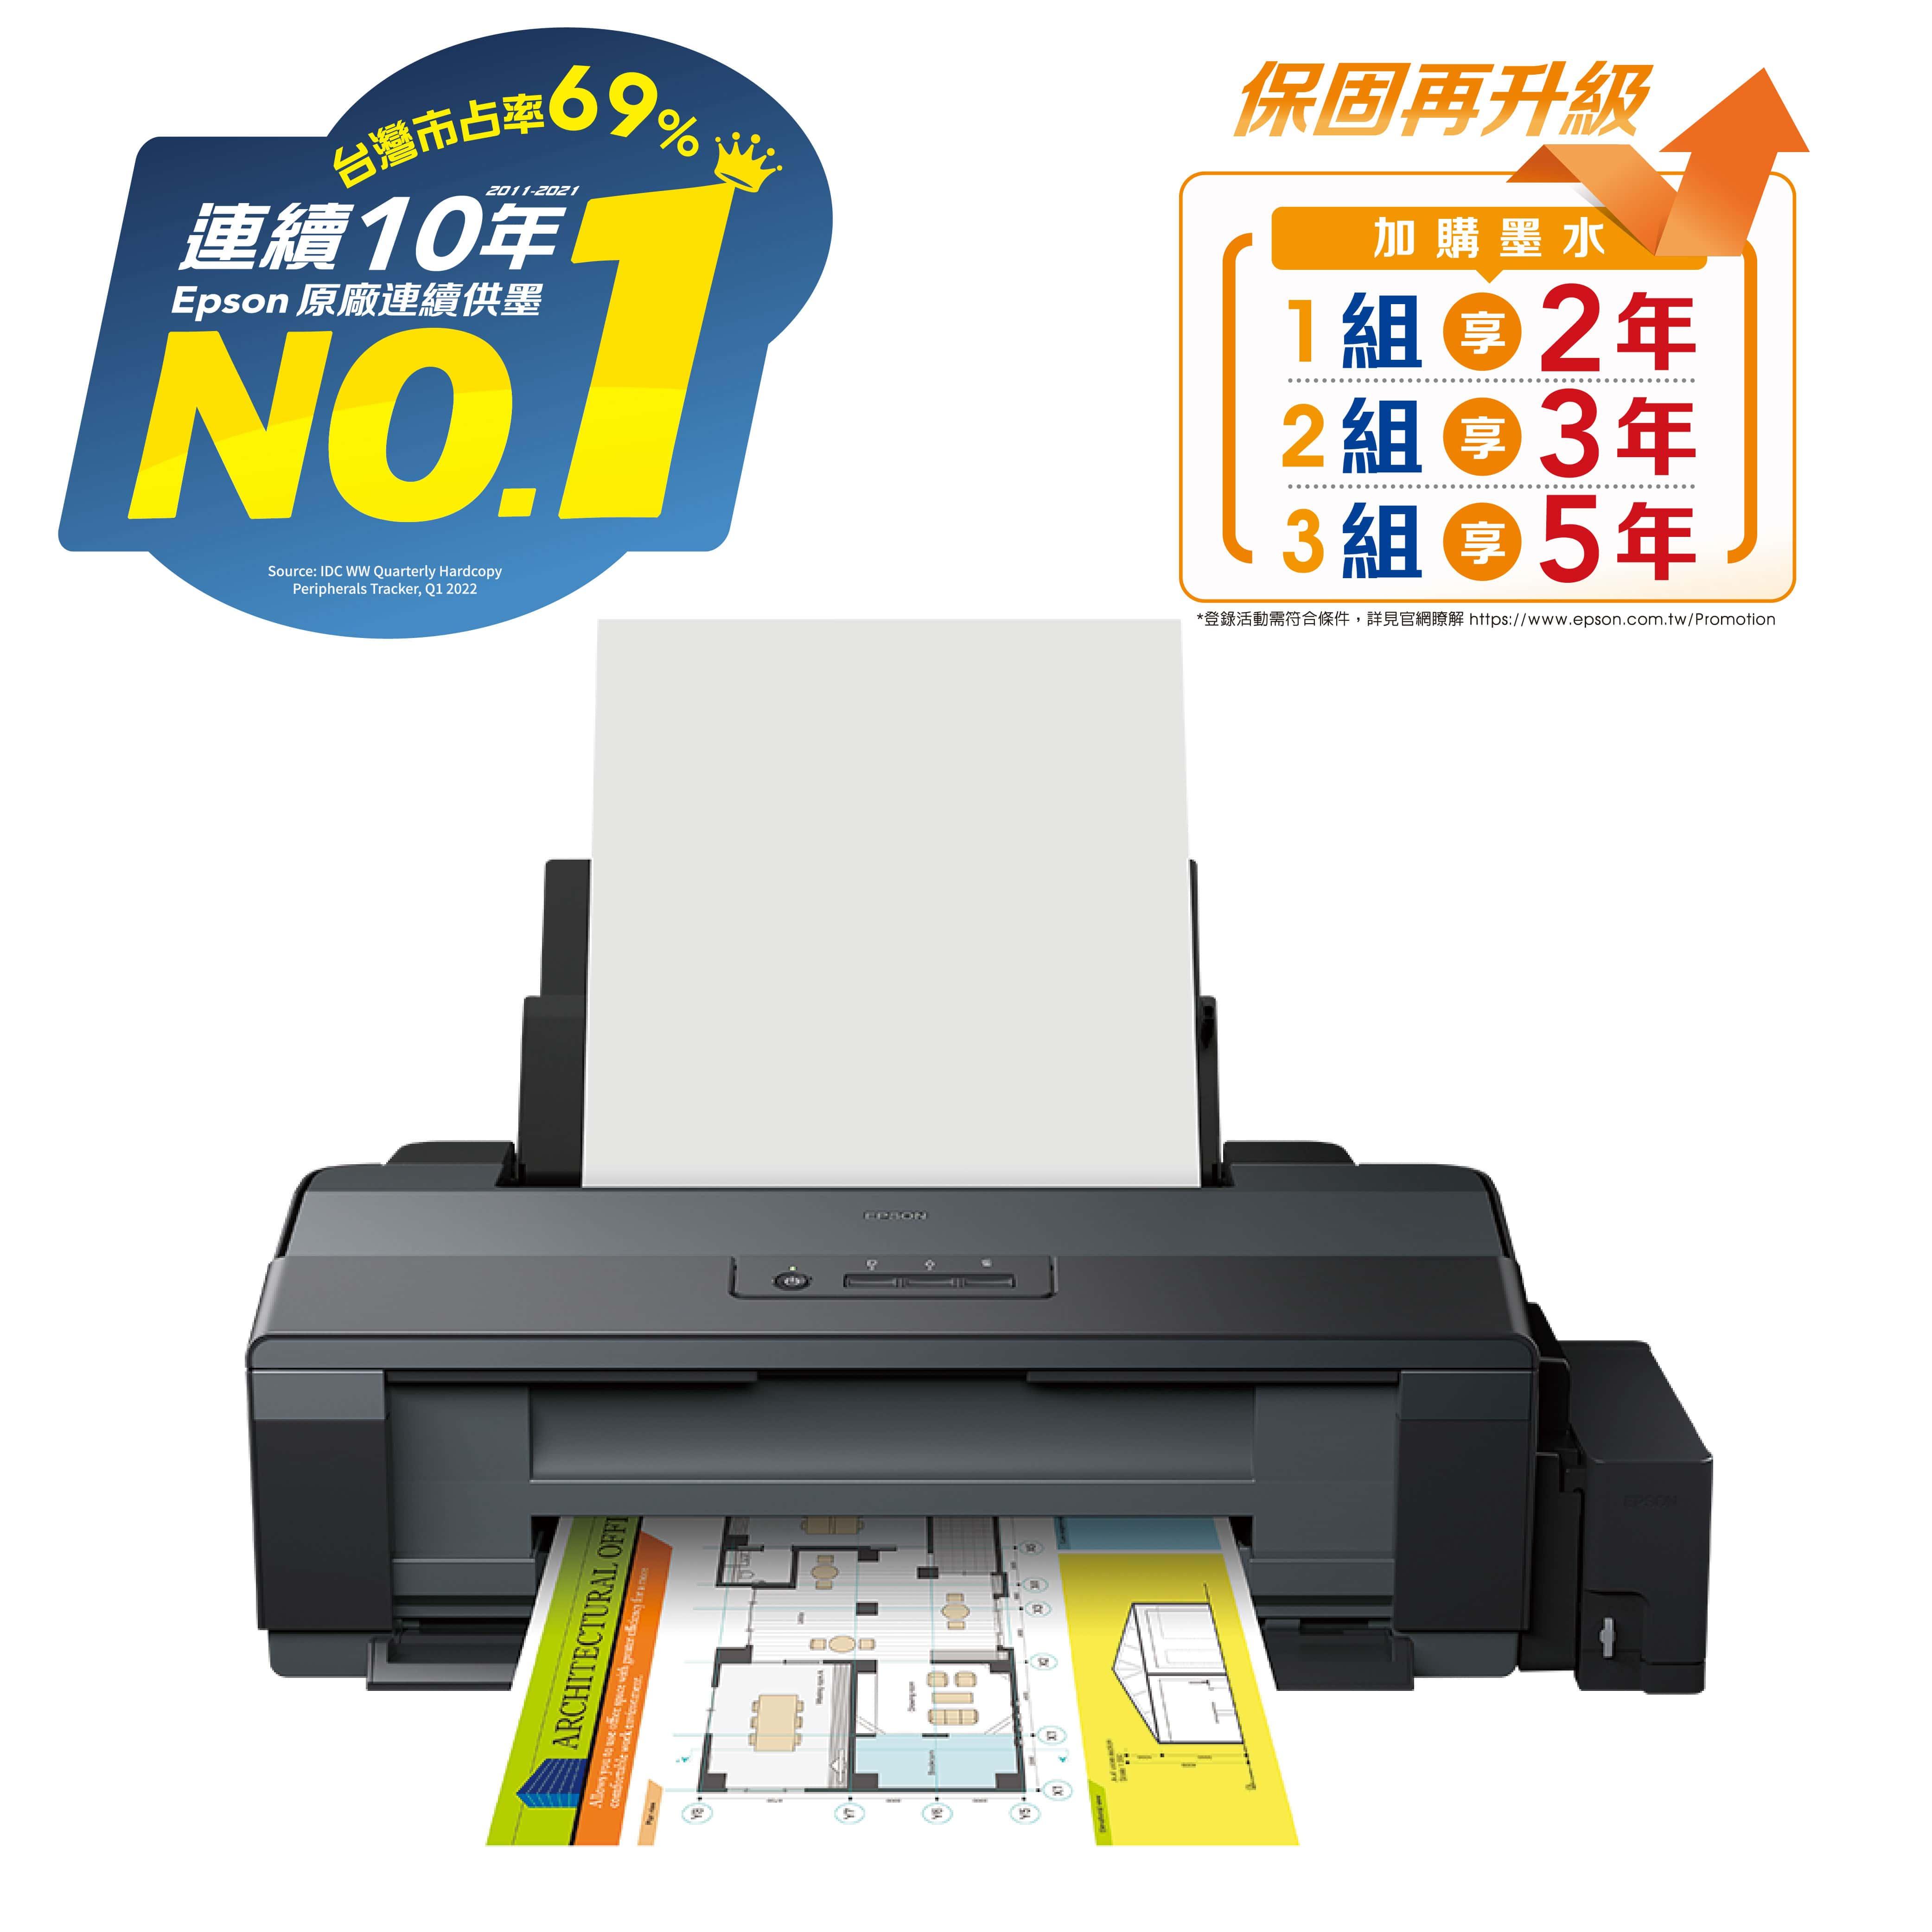 EPSON L1300 A3+連續供墨印表機(C11CD81506)